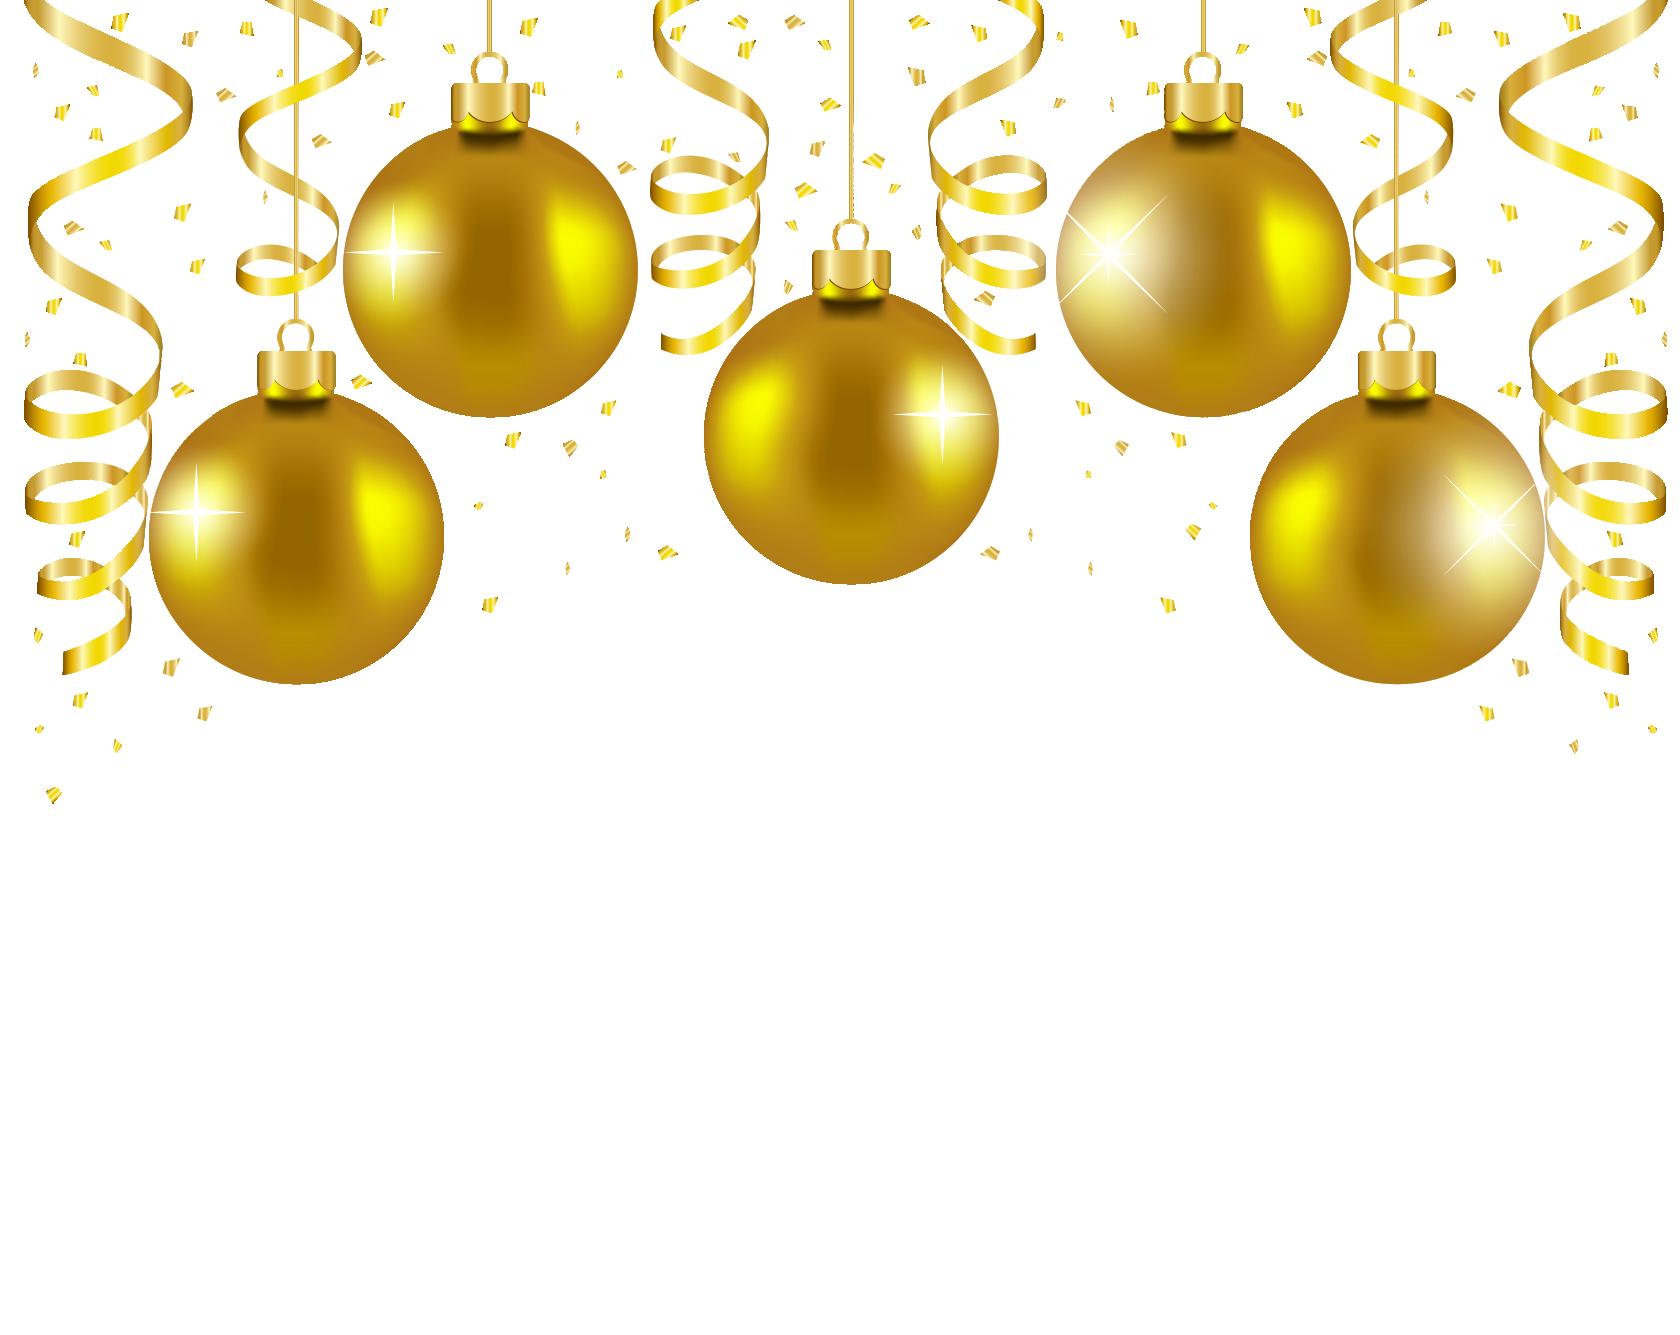 Transparent Gold Christmas Balls Decor Png Picture Gold Christmas Christmas Balls Decor